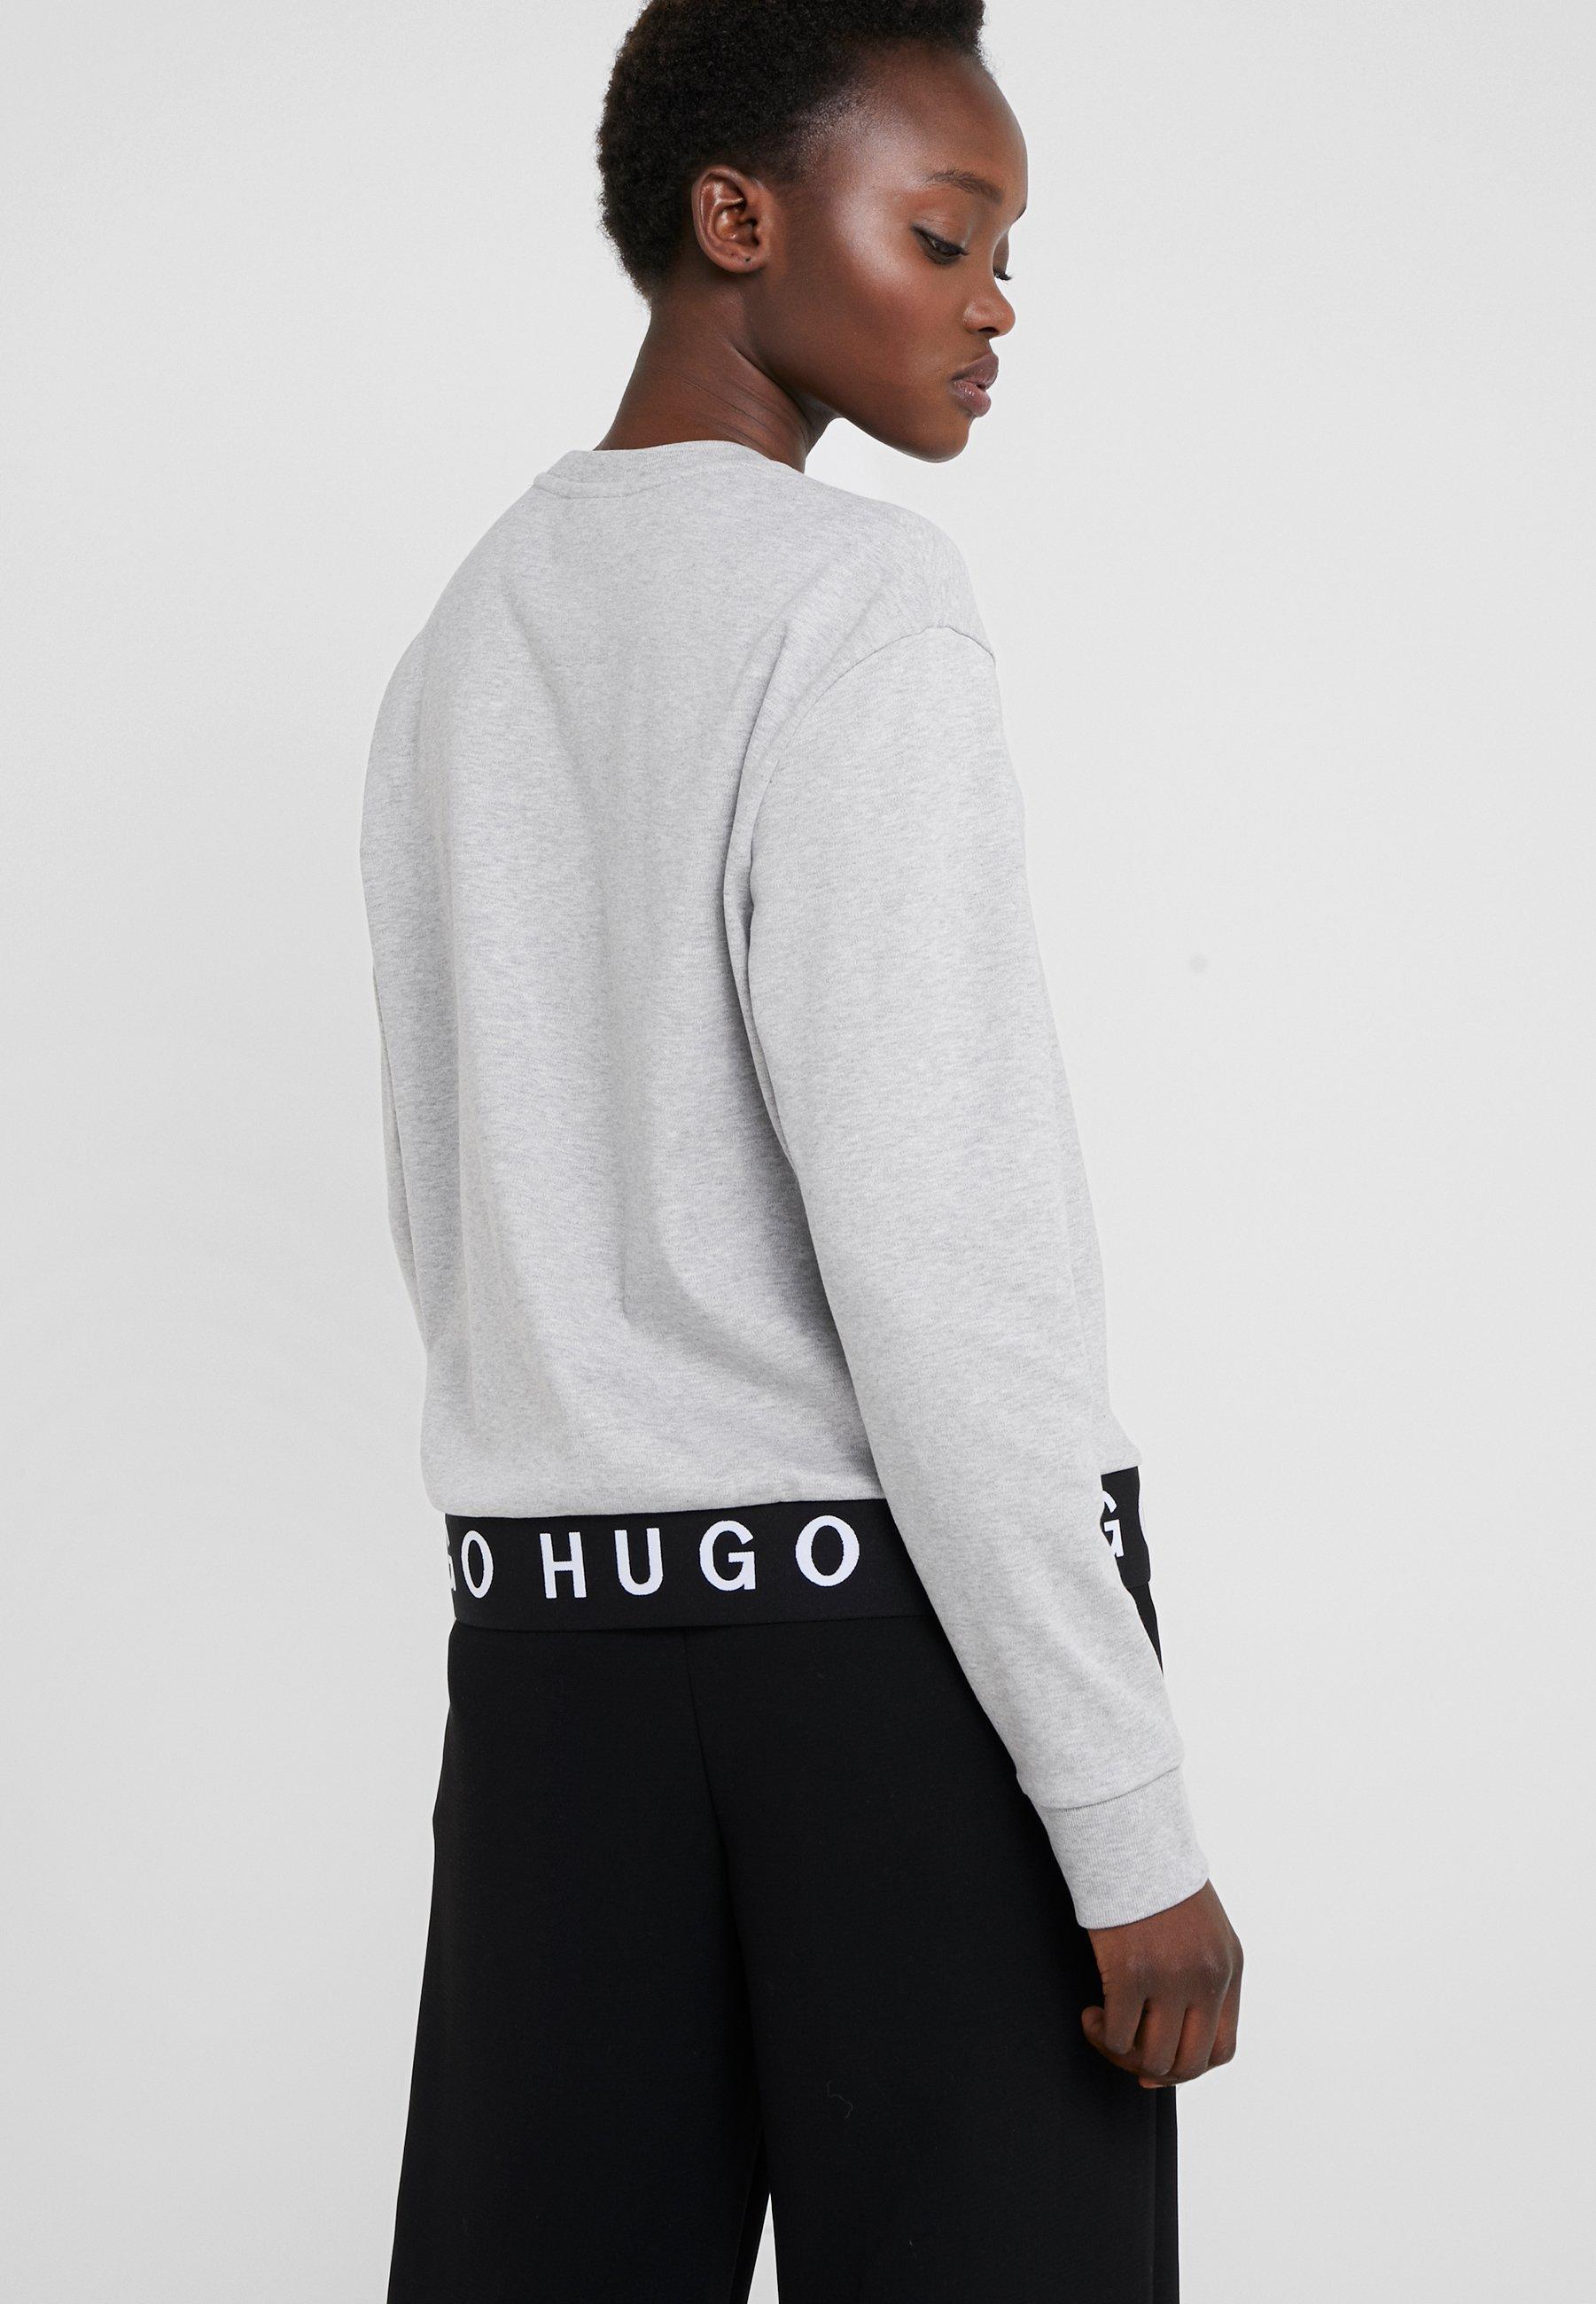 Hugo NicciT shirt Longues À Manches Grey P8k0wOnX